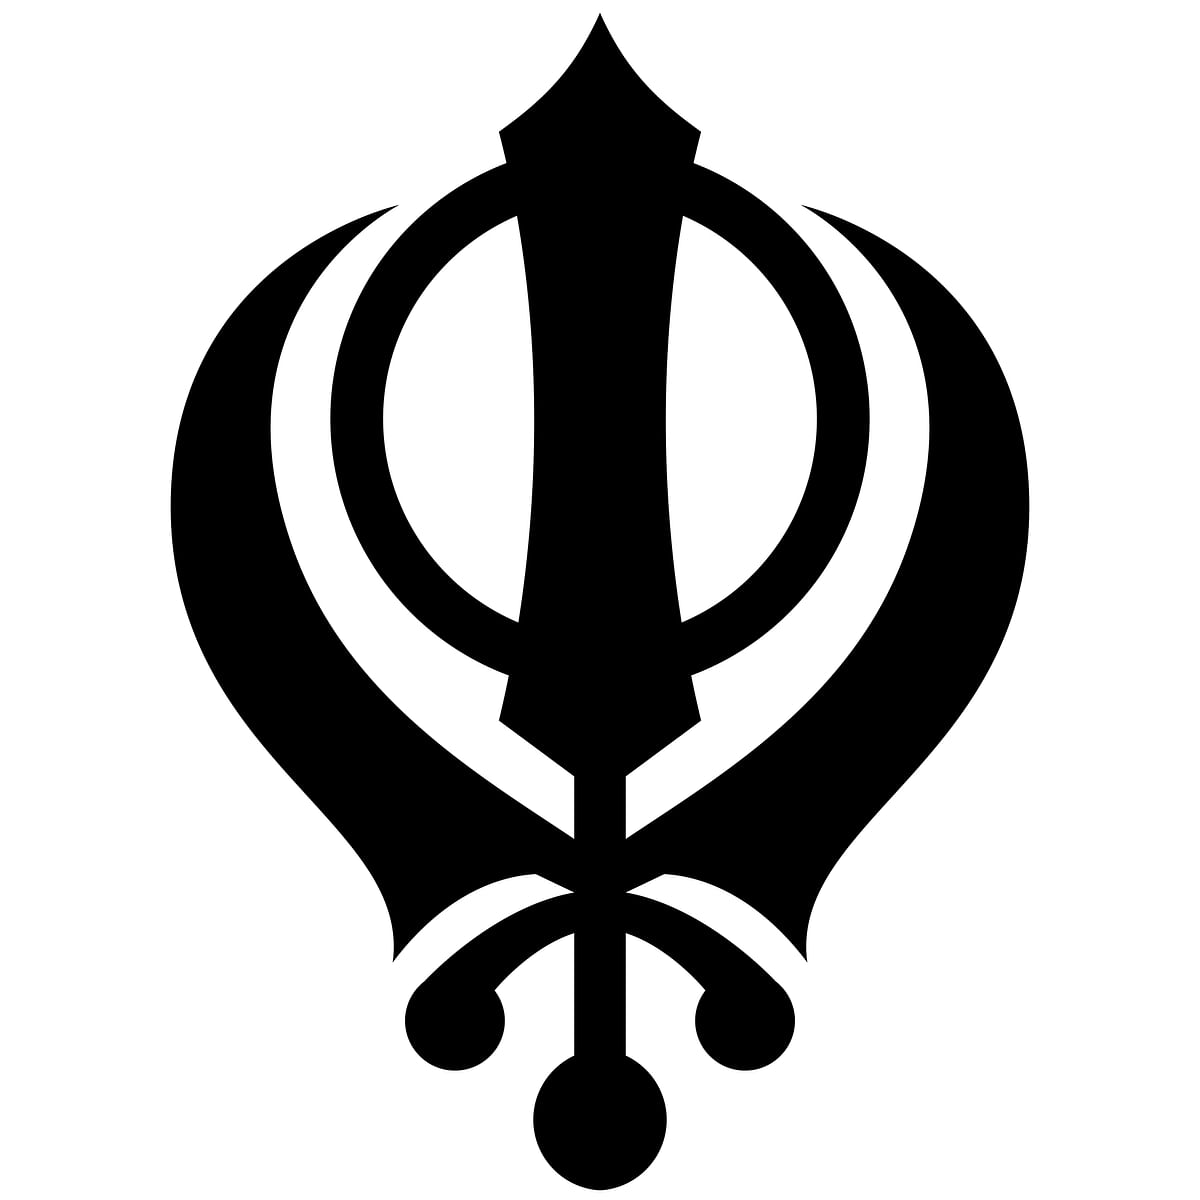 गुरू हर किशन साहिब जी - Guru Harkishan Sahib